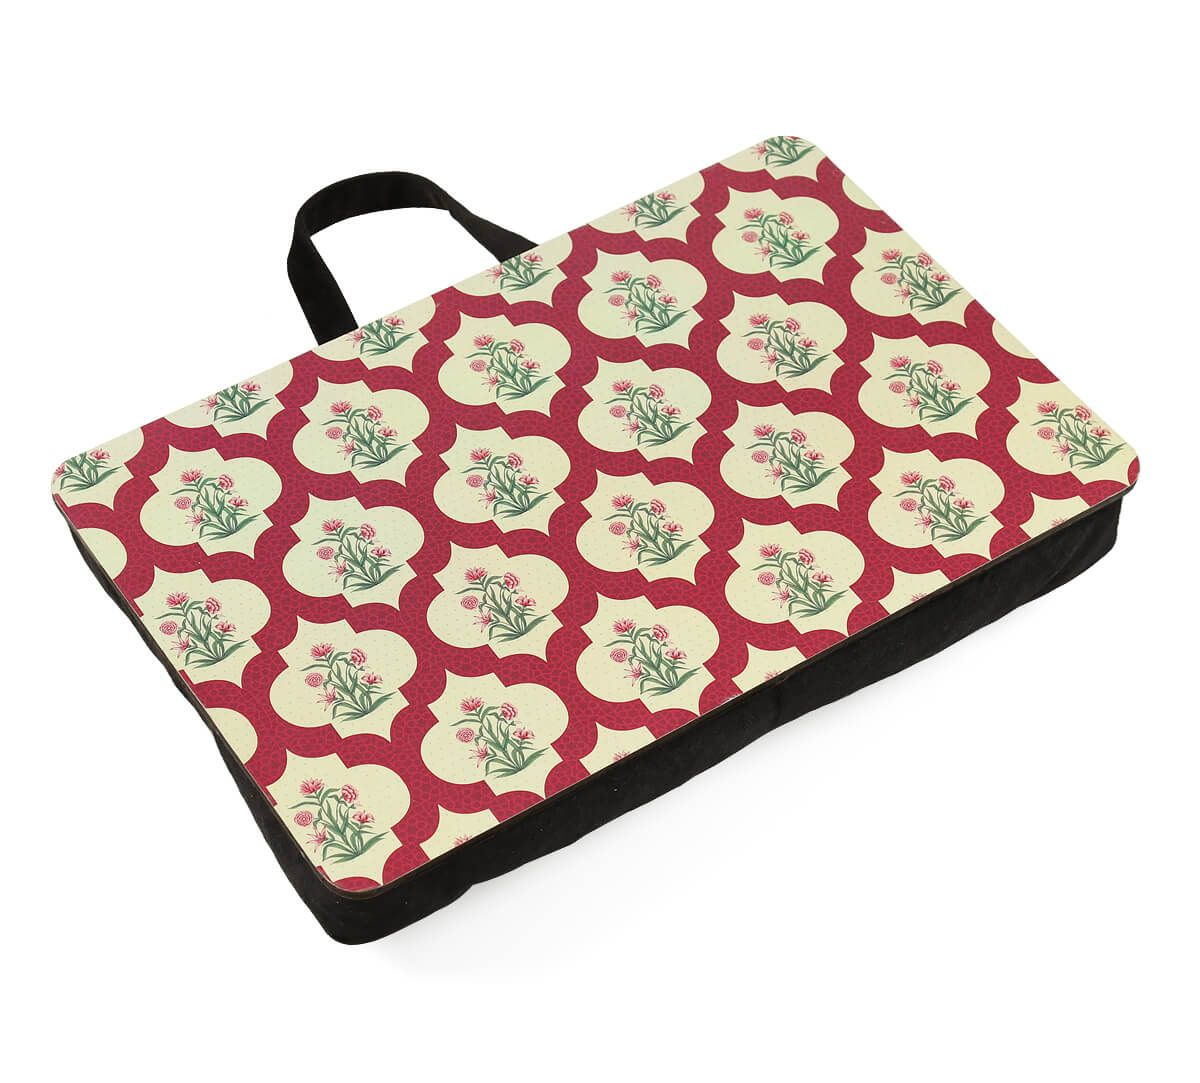 India Circus Poppy Flower Scarlet Lap Tray